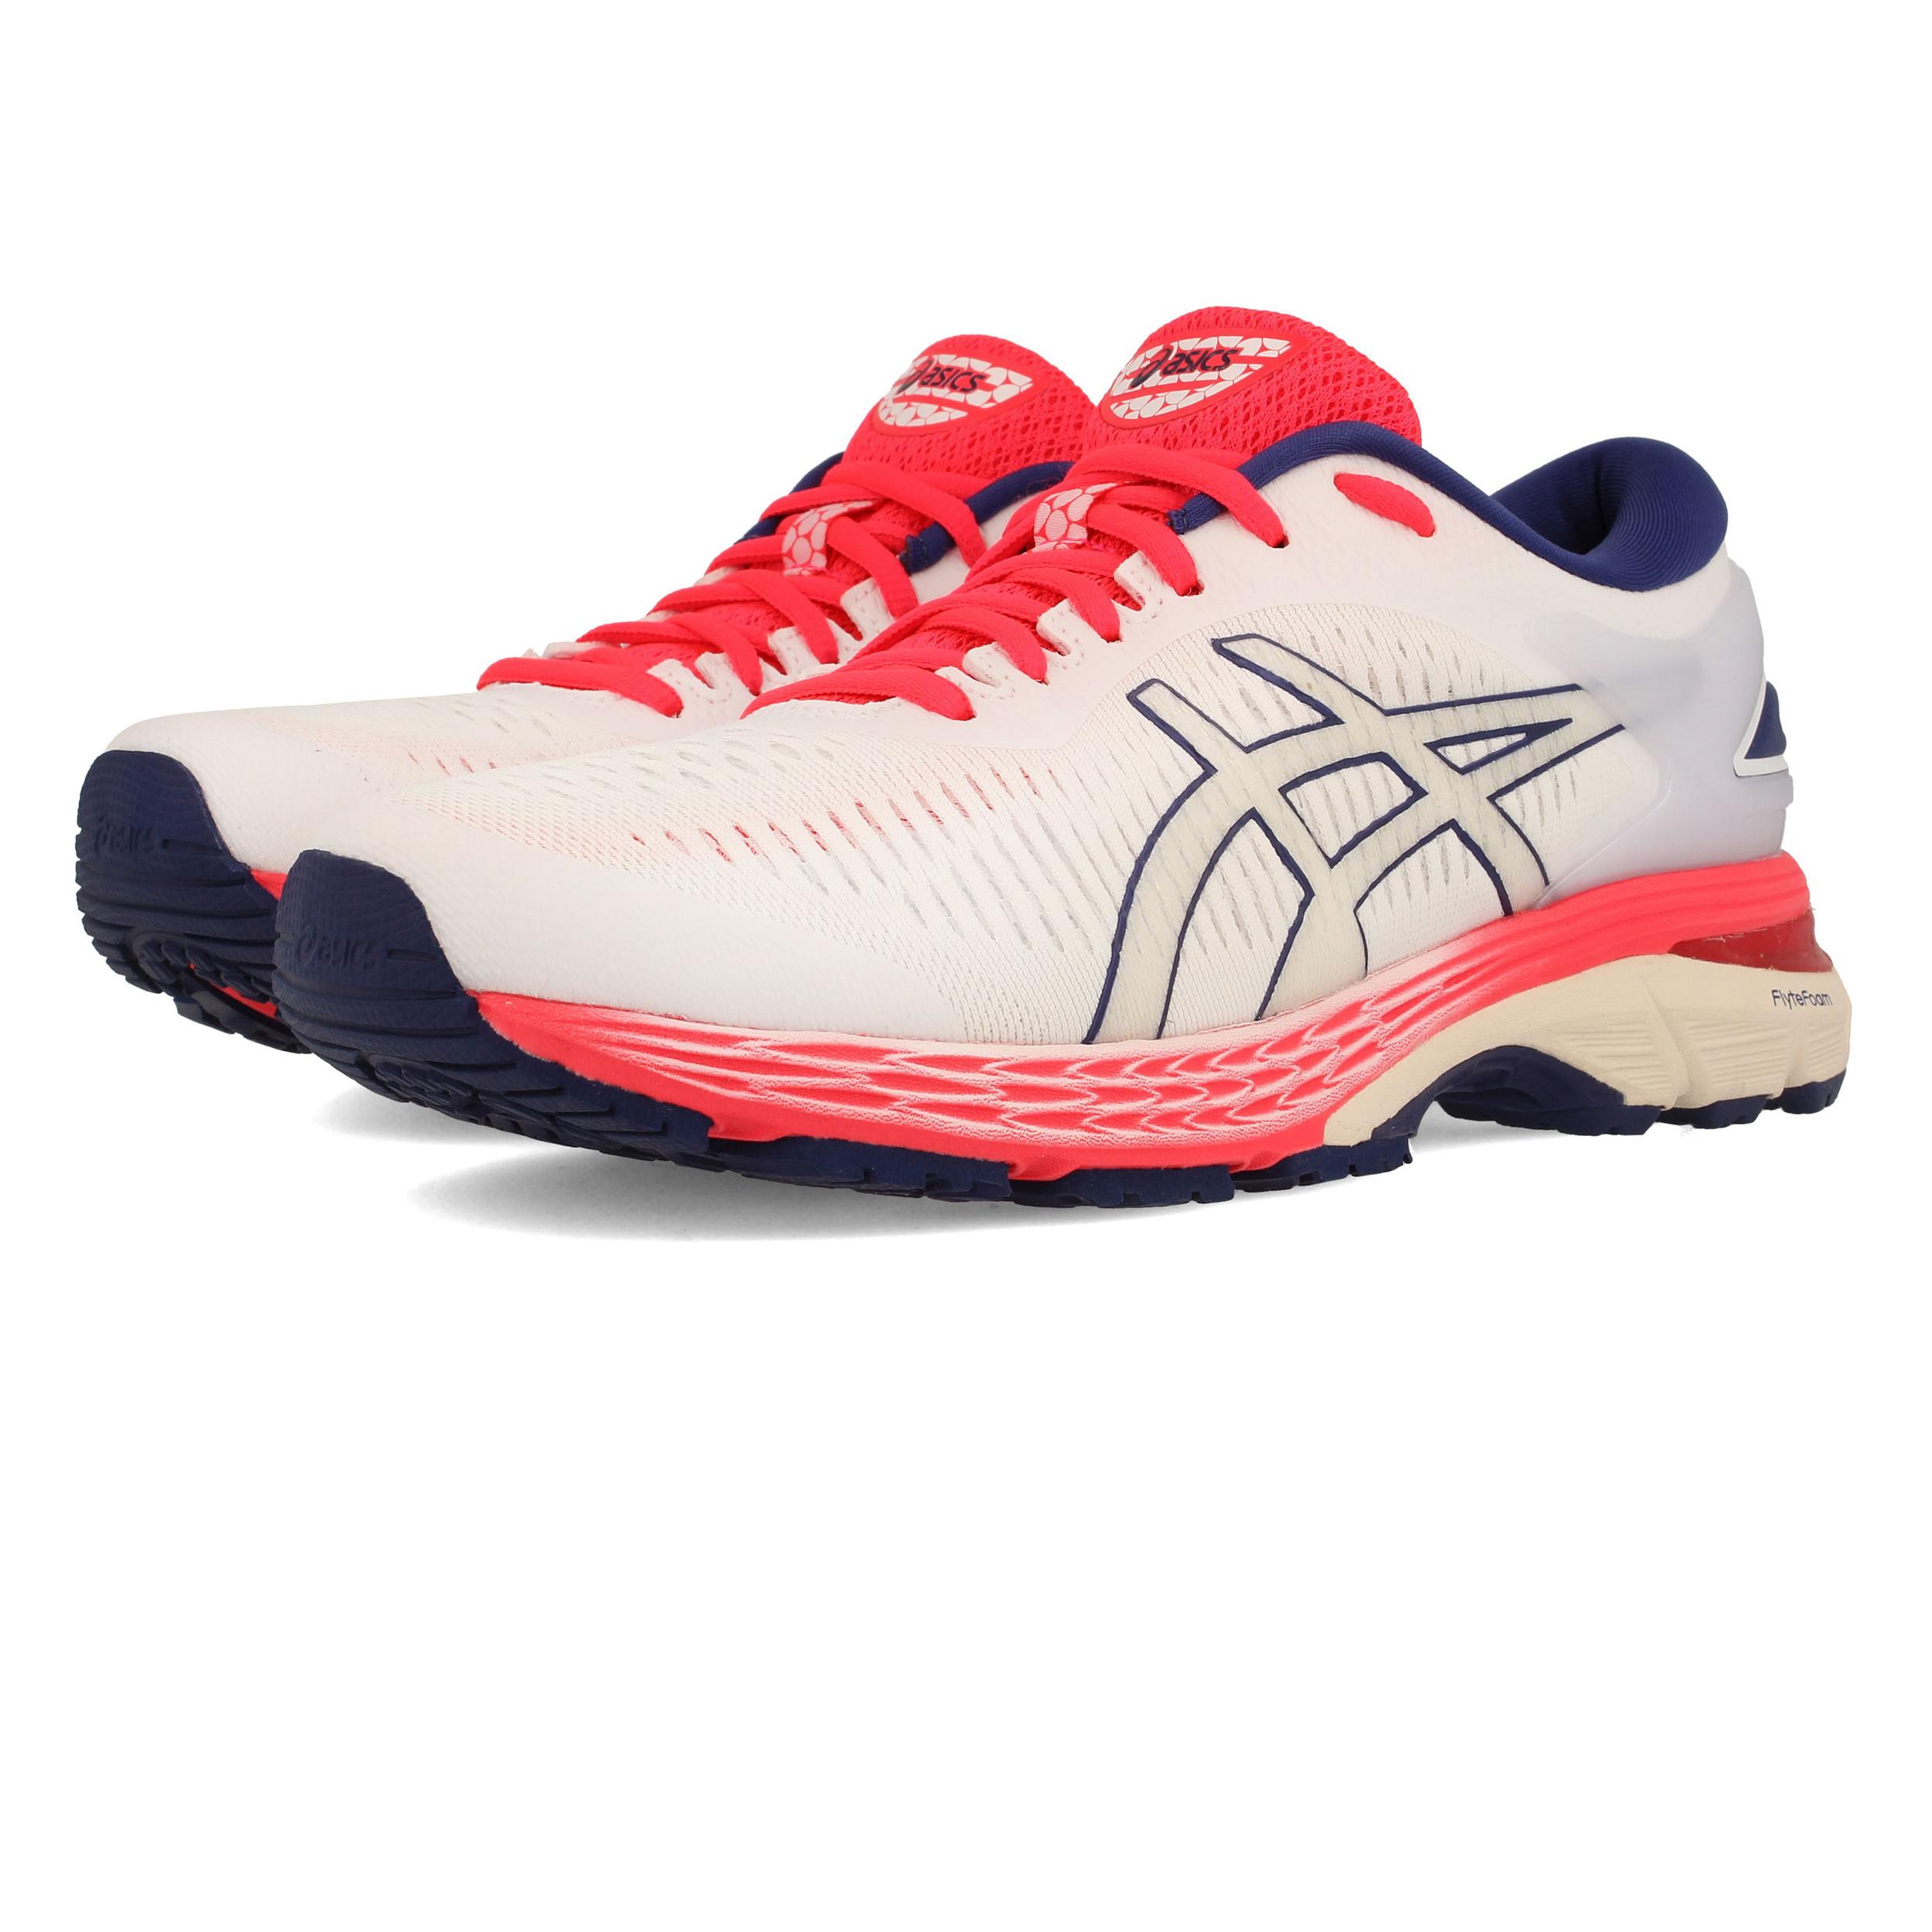 Asics Damenschuhe Gel-Kayano 25 Running Schuhes Trainers Turnschuhe Weiß Sports